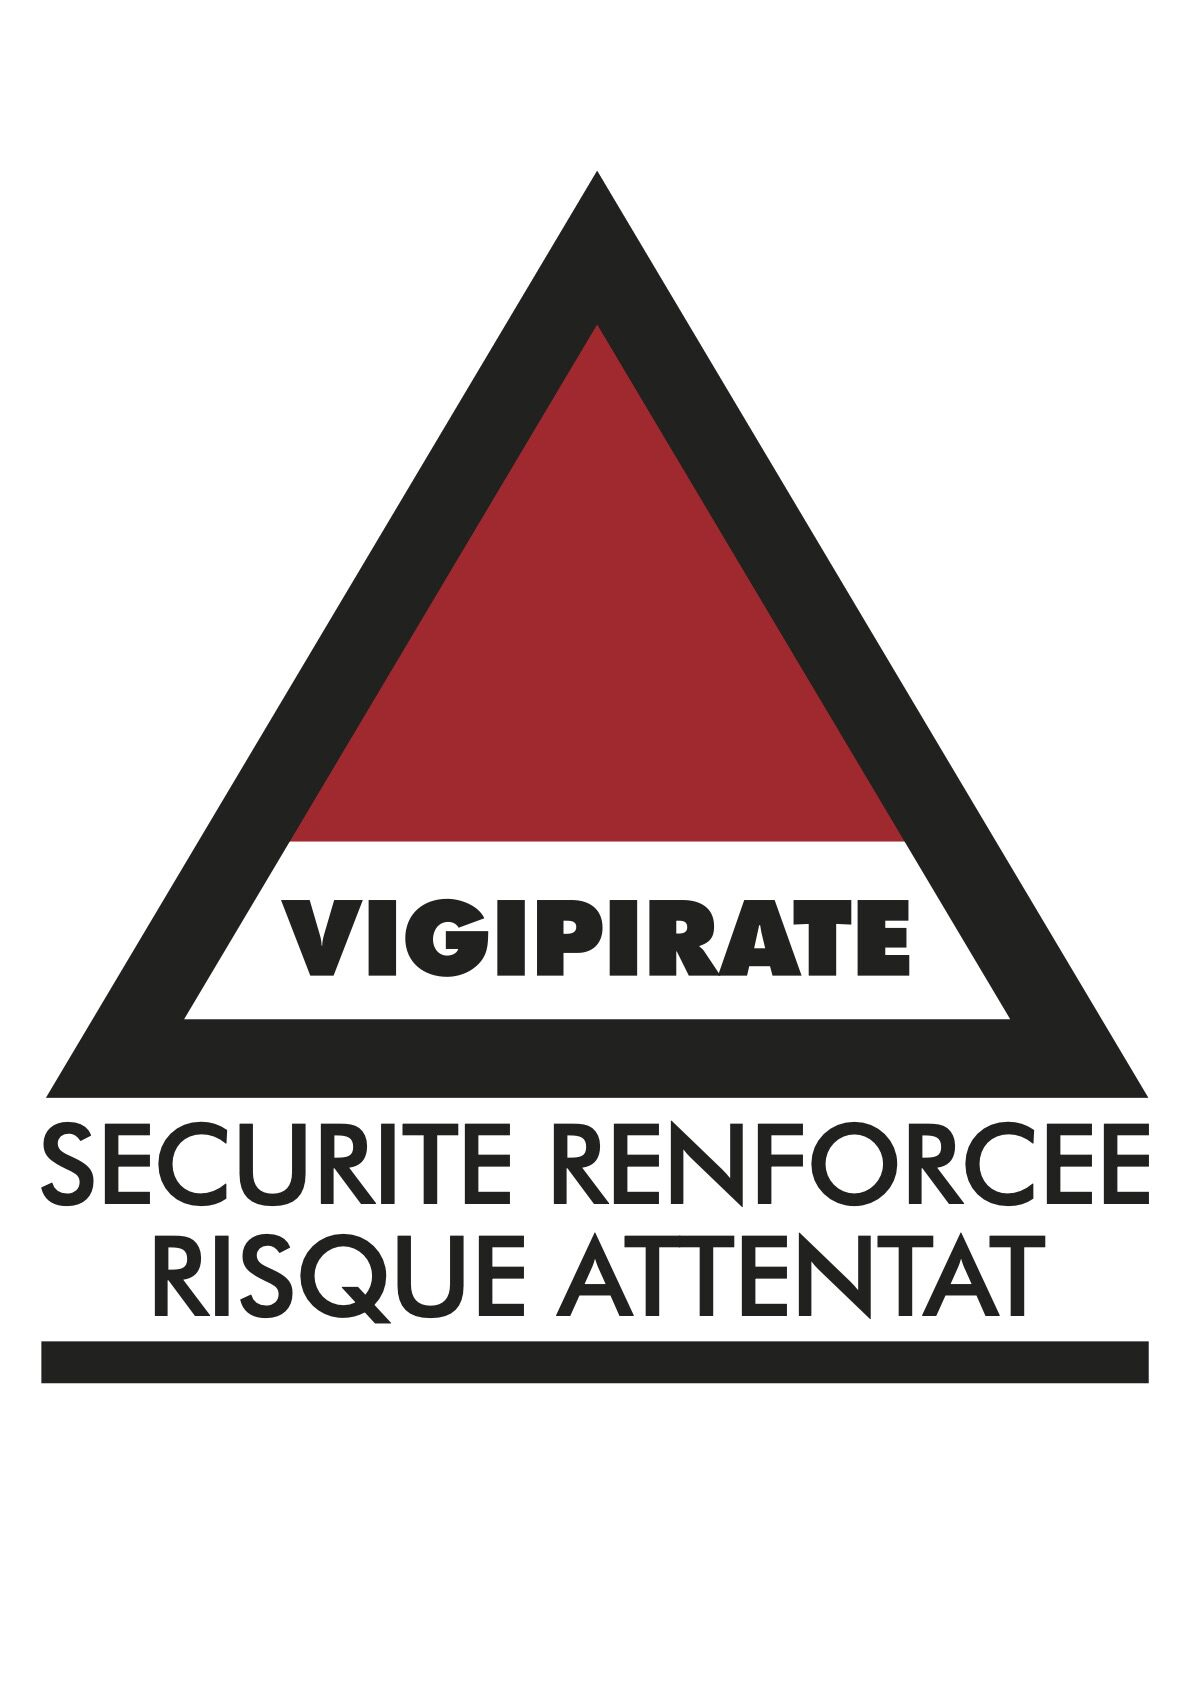 logo-vigipirate_risque attentat.jpg